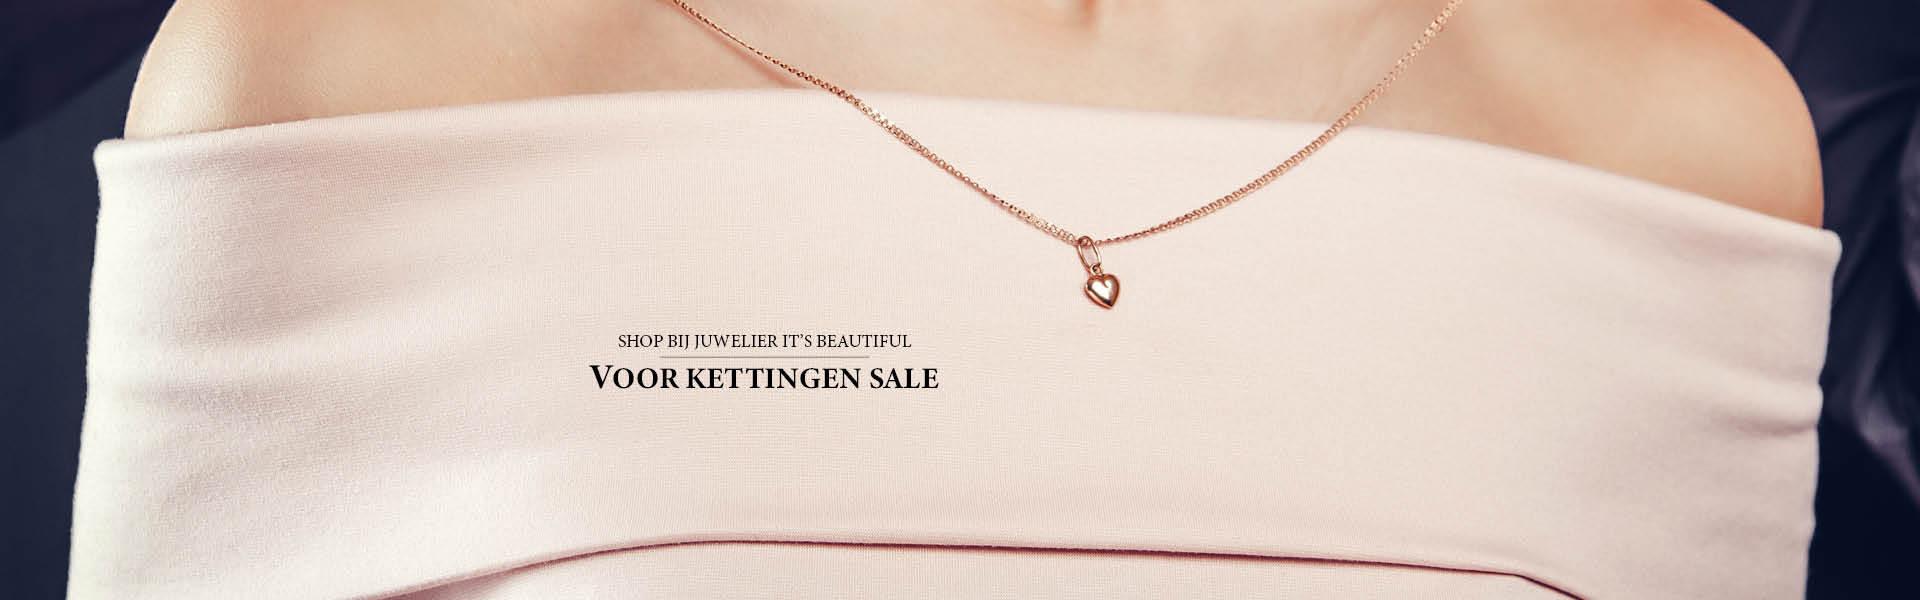 Kettingen Sale